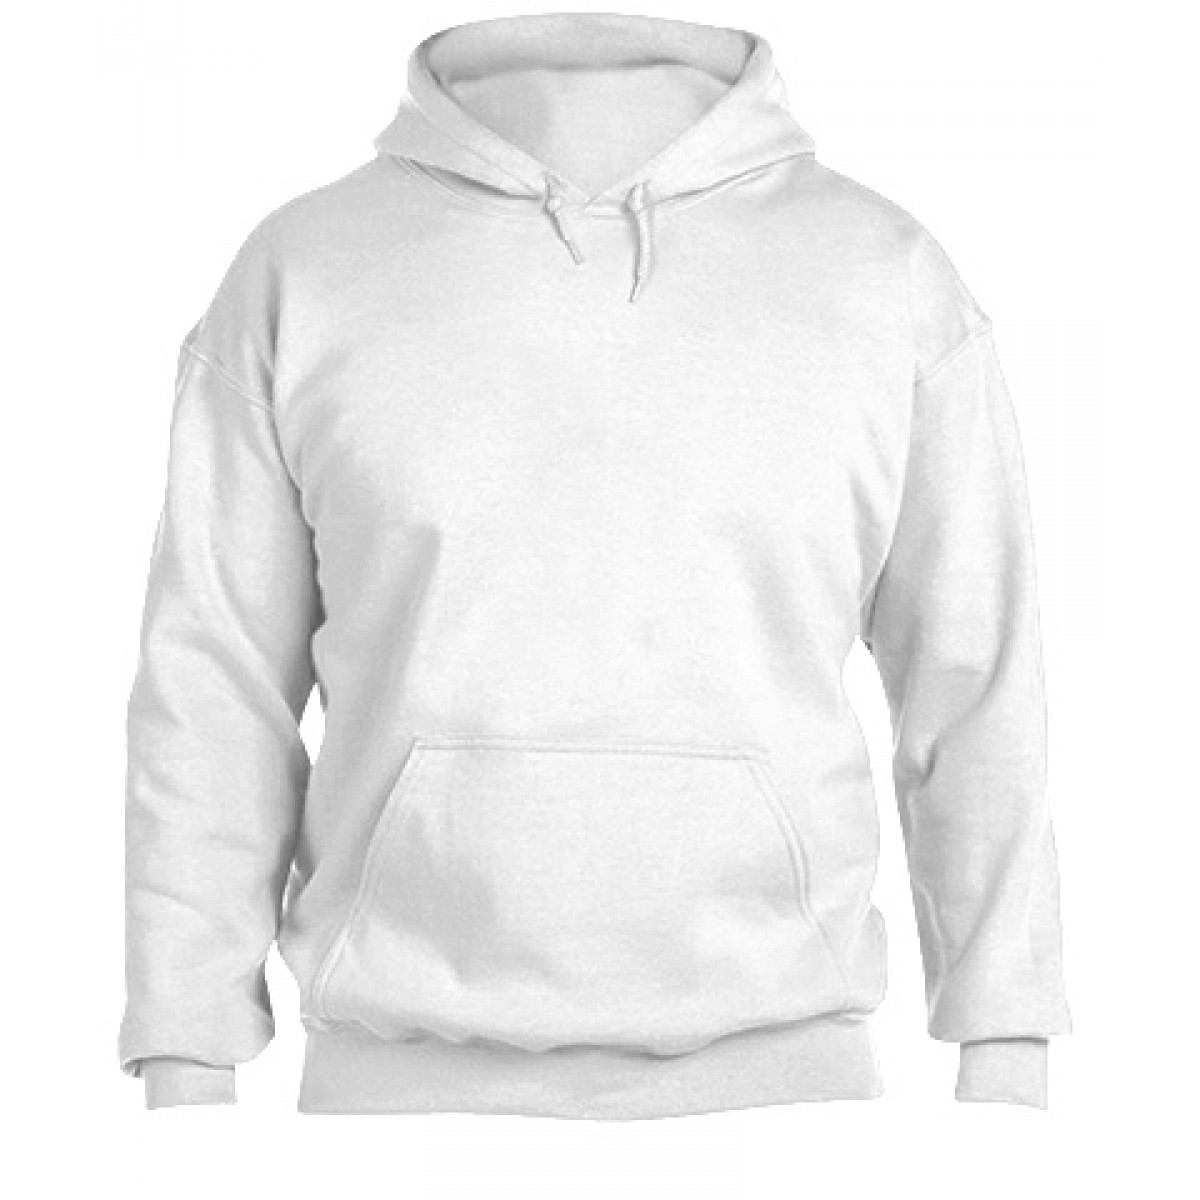 Hooded Sweatshirt 50/50 Heavy Blend -White-2XL